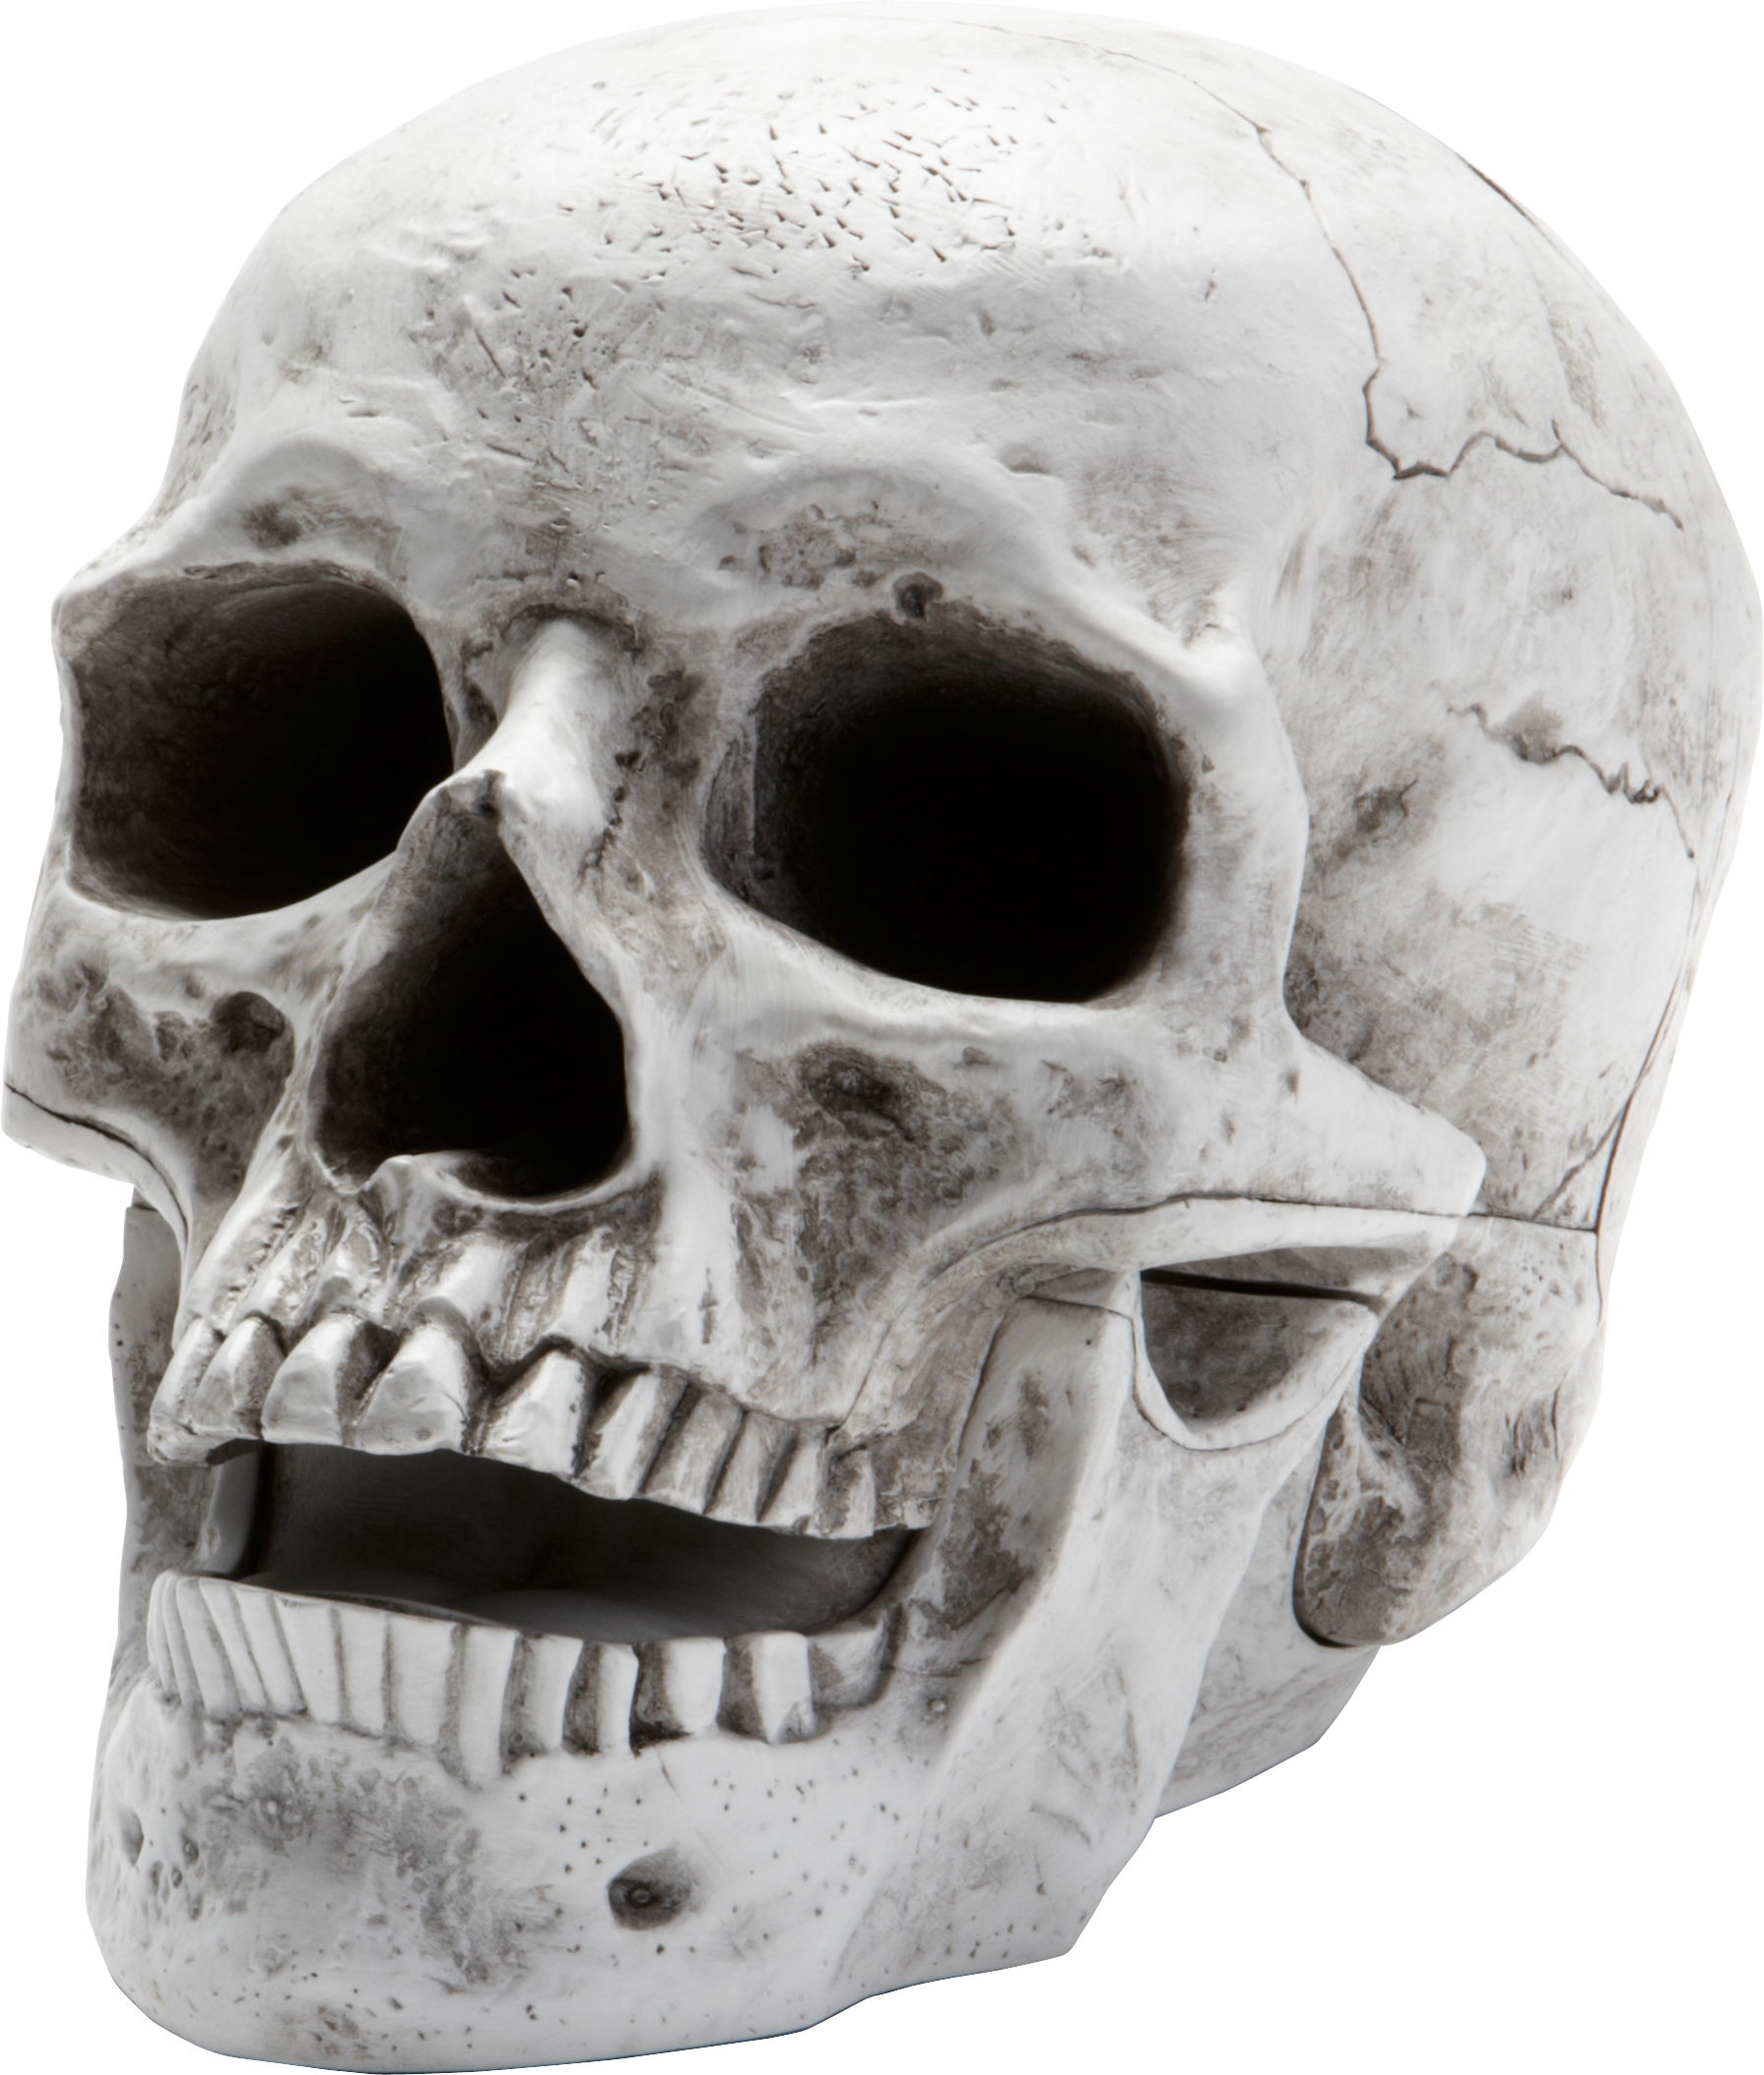 Skull PNG image - Skull PNG